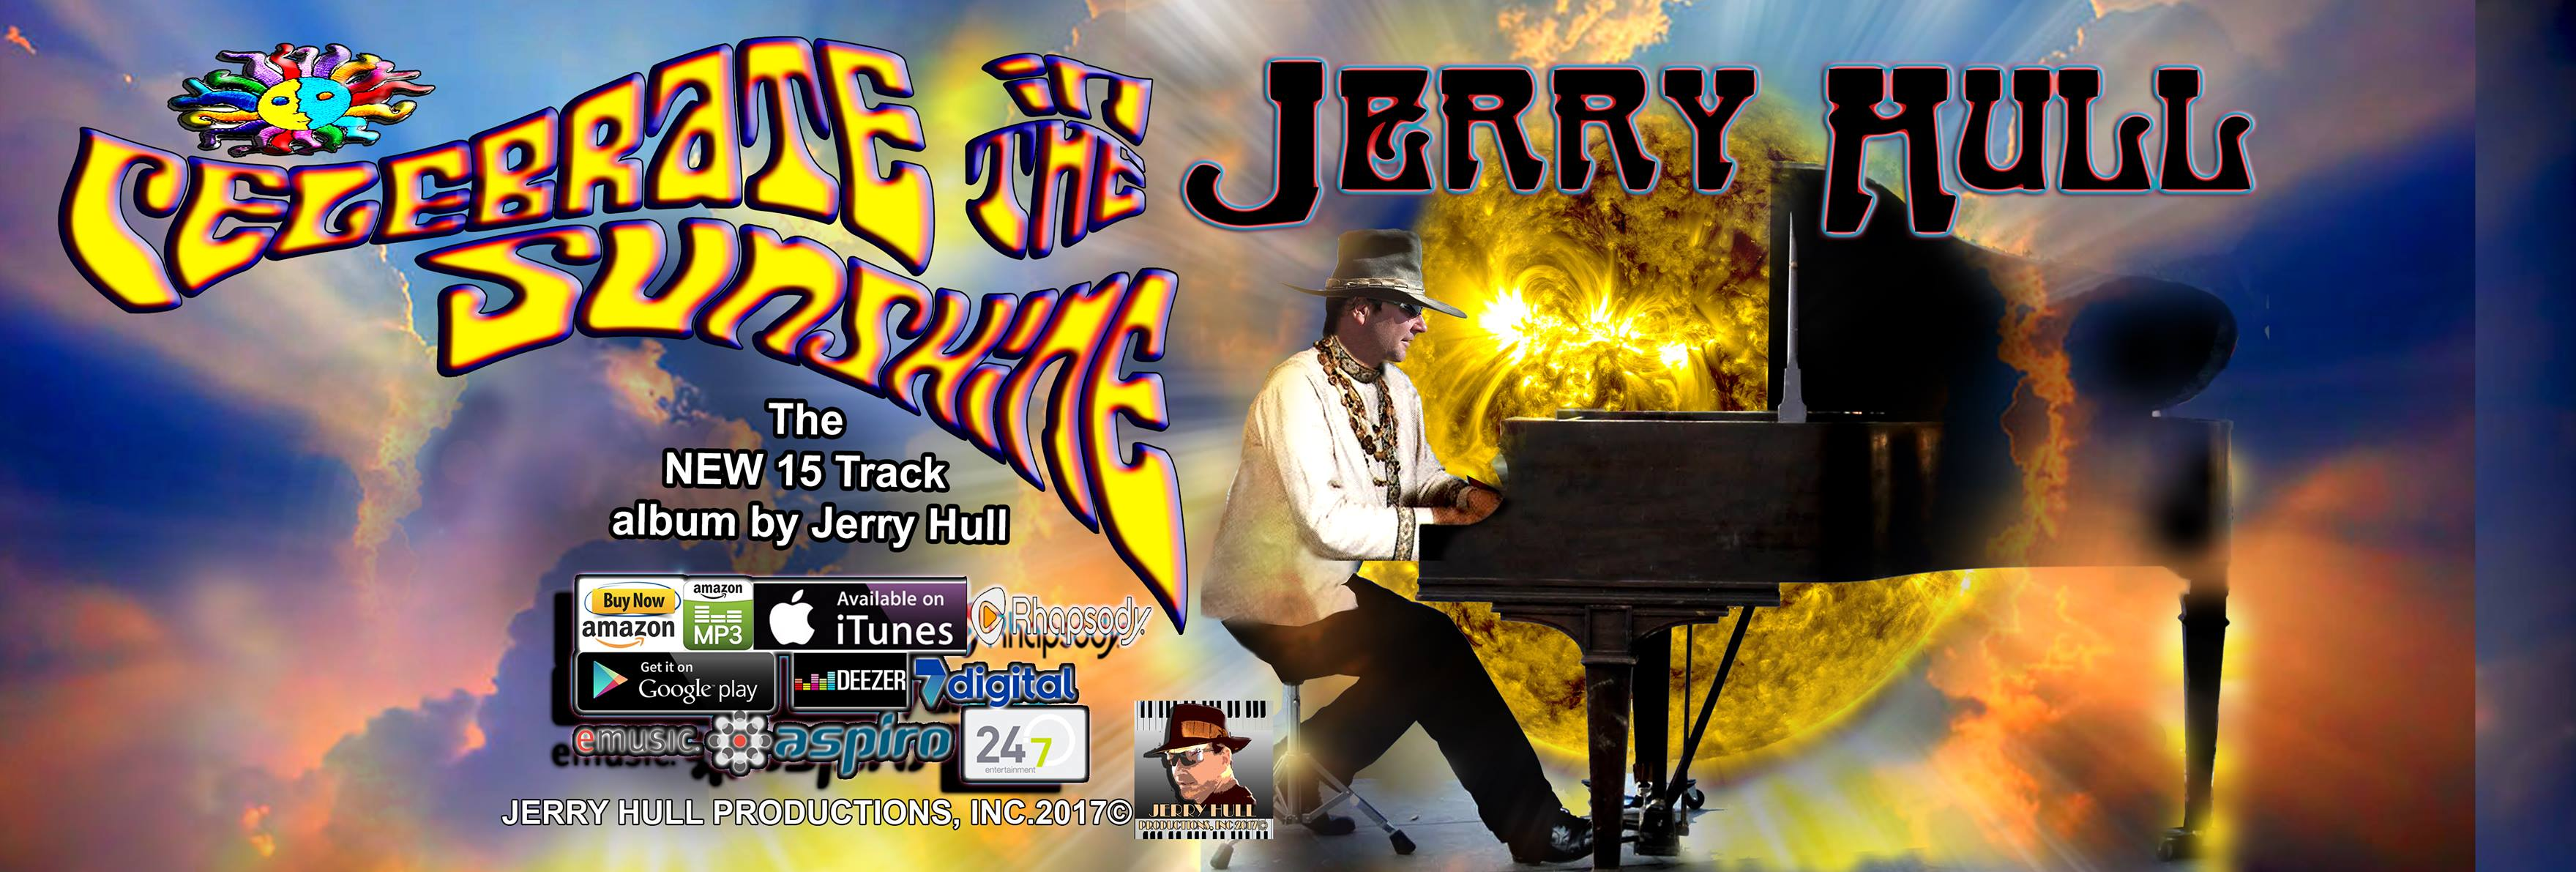 Jerry Hull